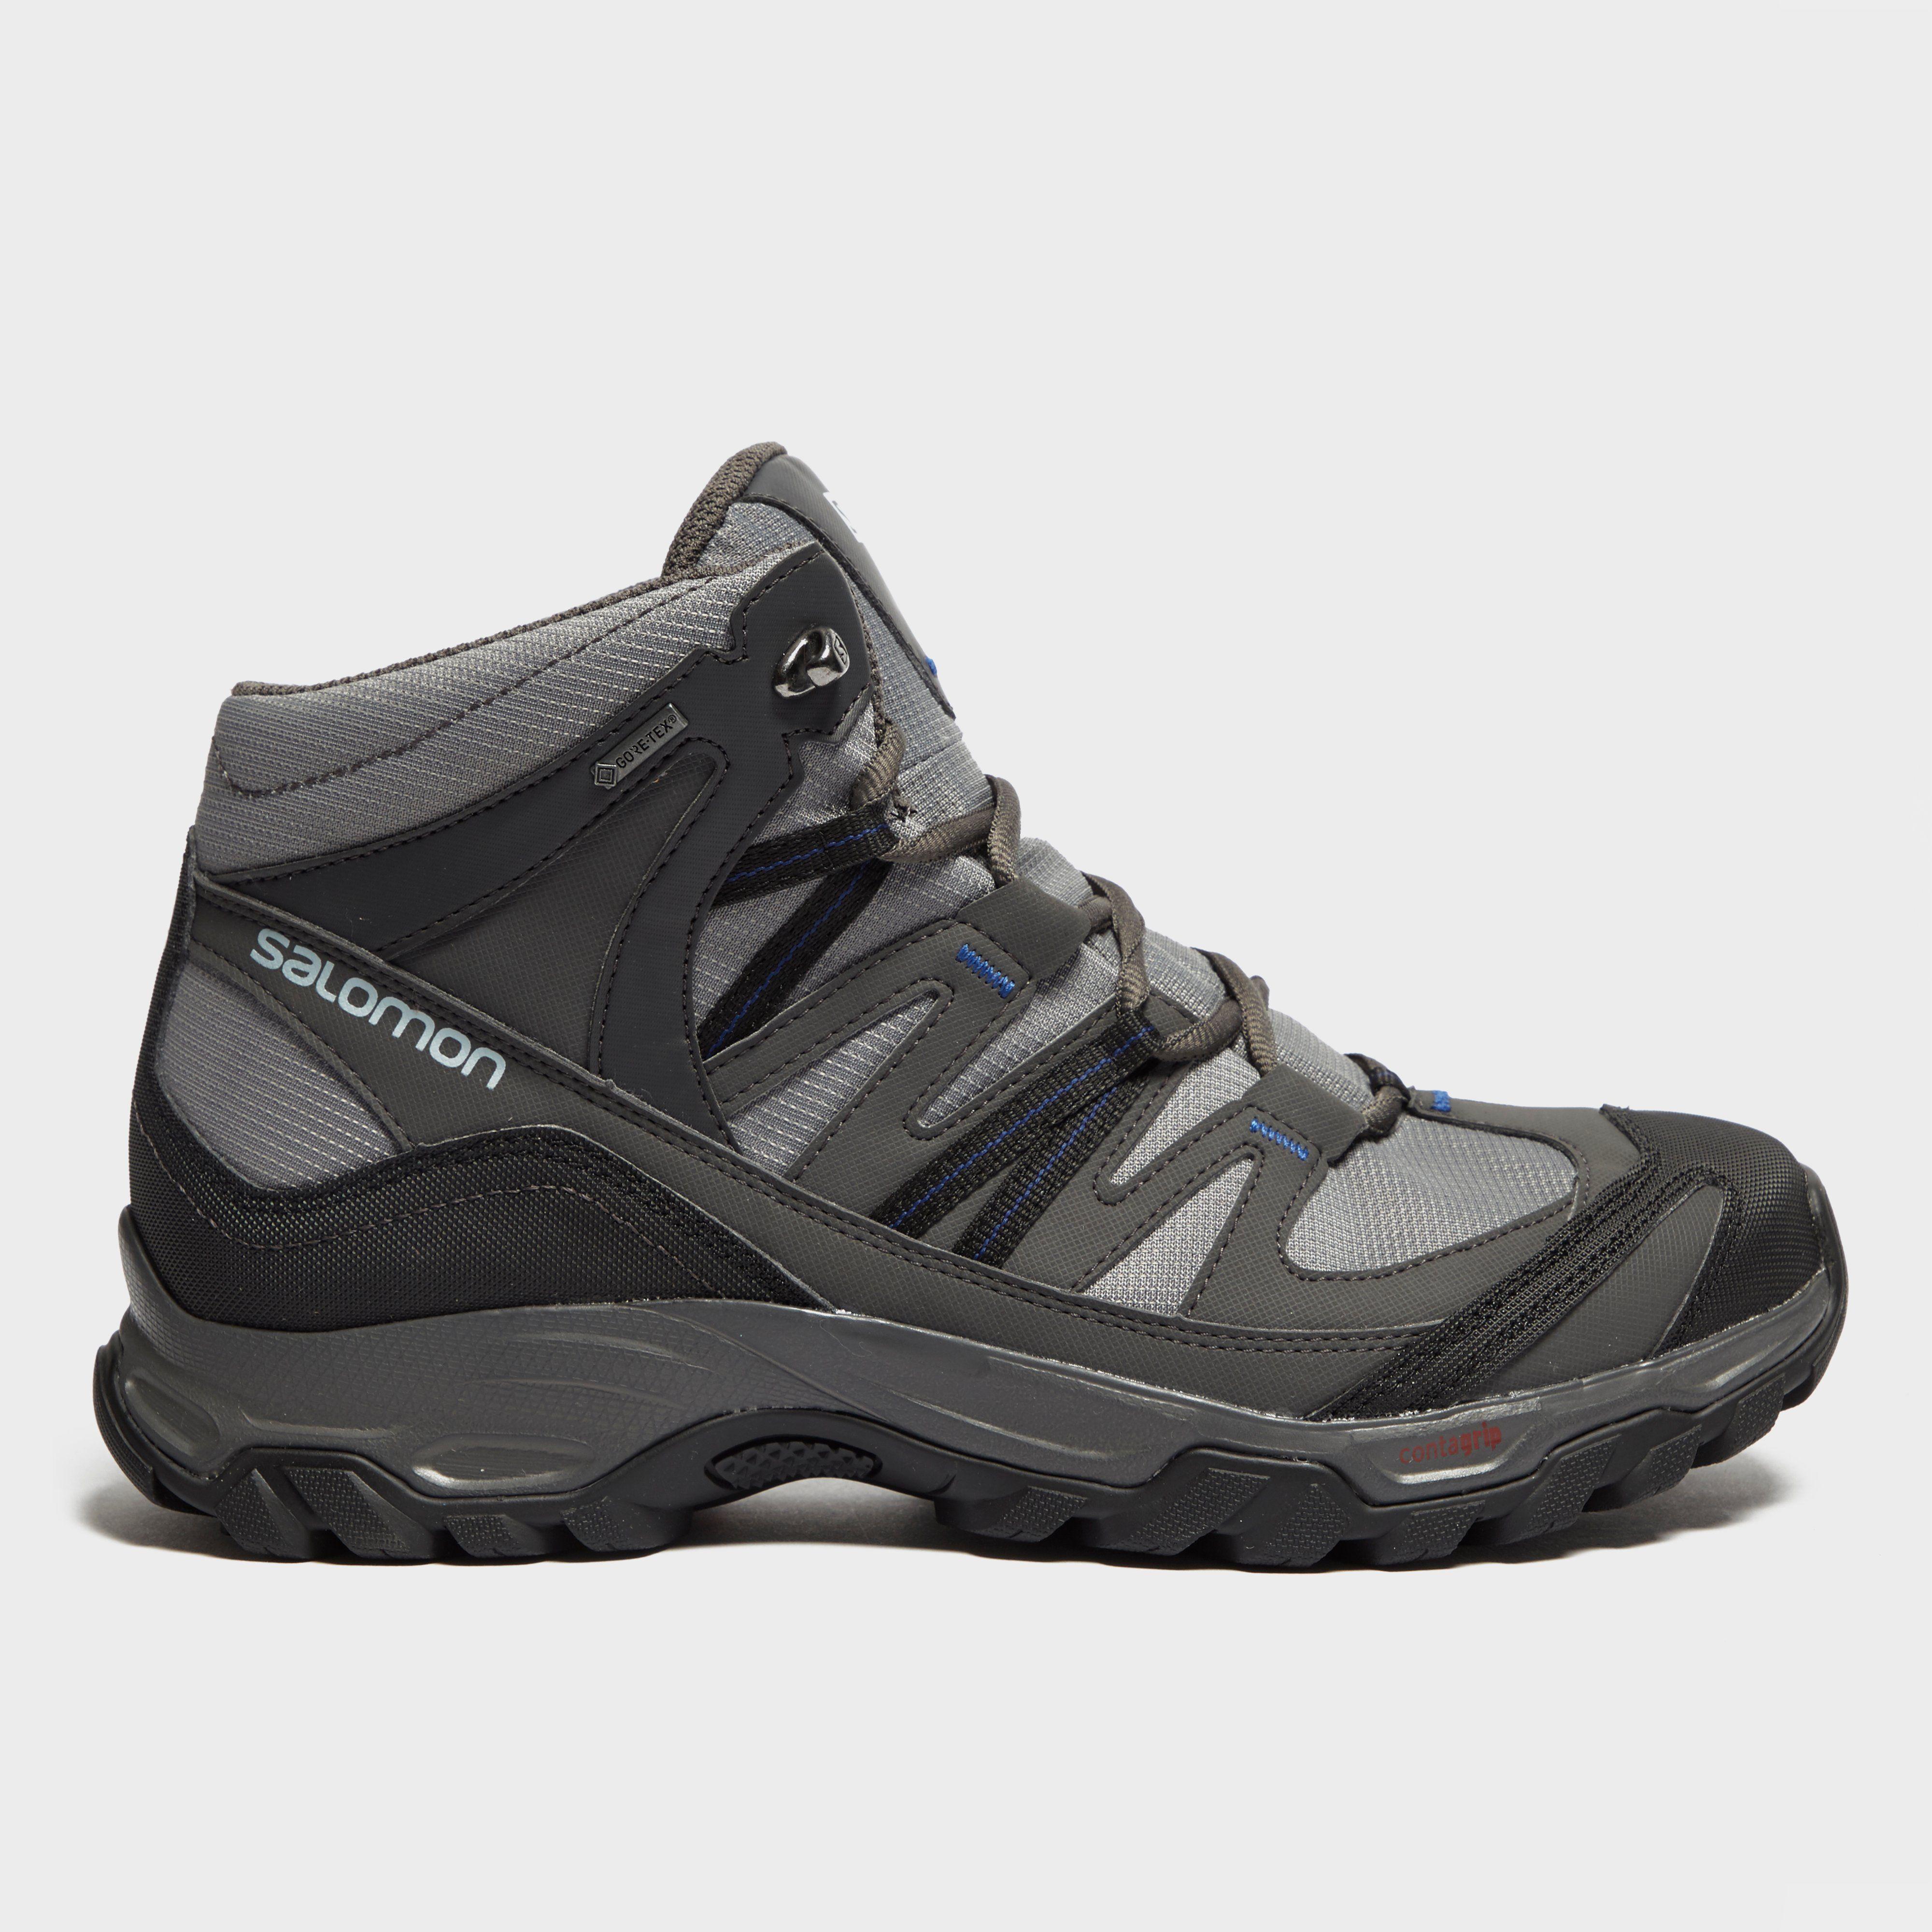 SALOMON Men's Mudstone GORE-TEX® Boots